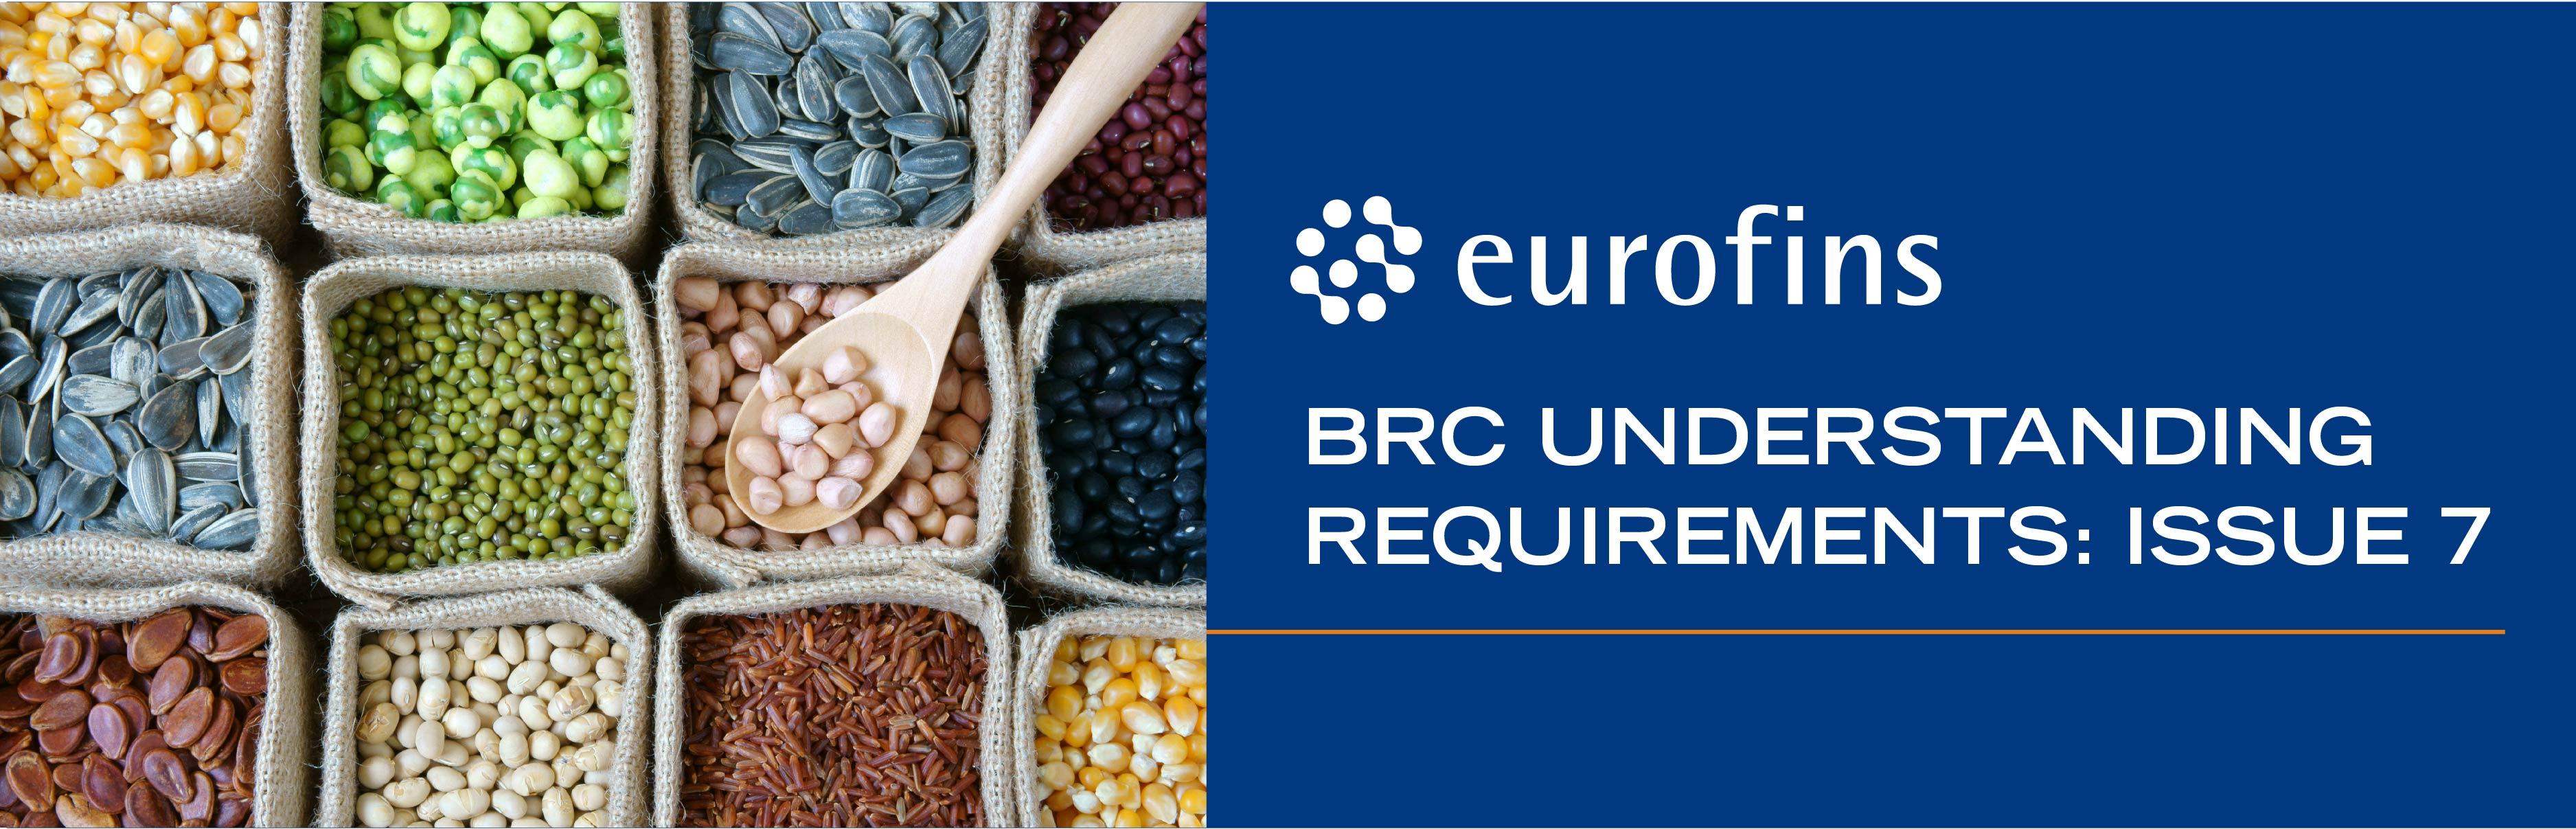 BRC Understanding Requirements Issue 7